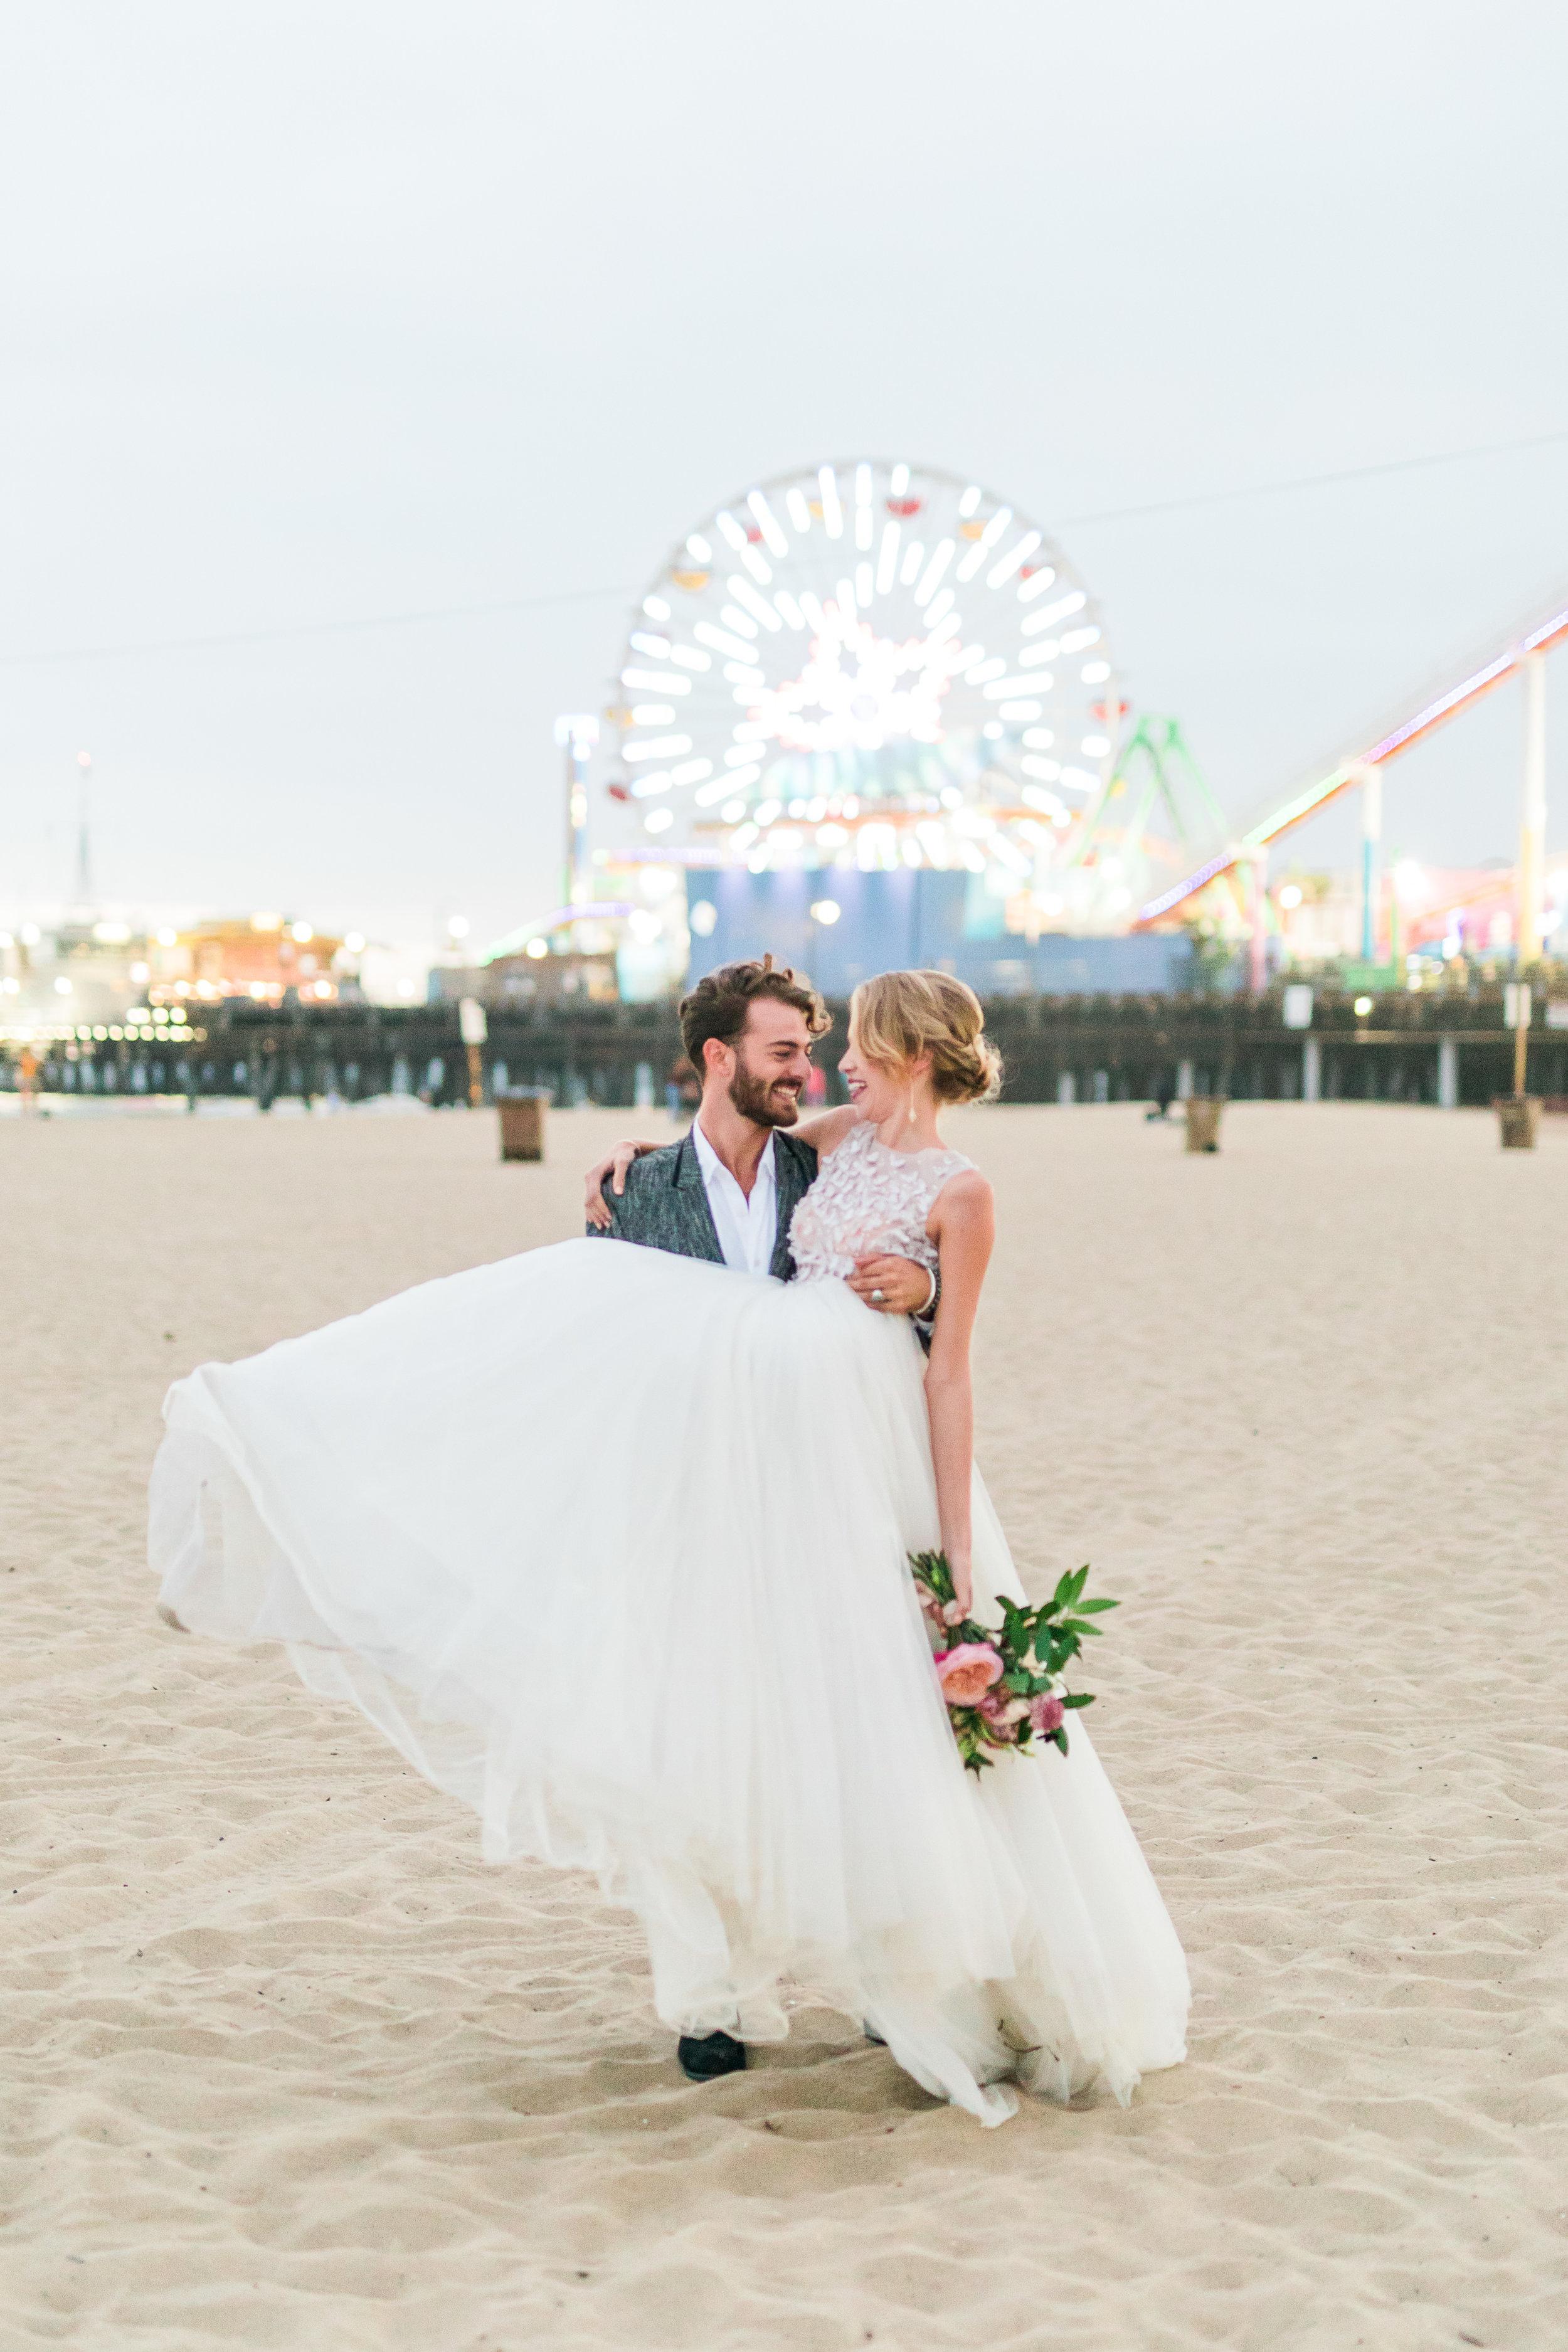 LA-Wedding-Shoot-by-JBJ-Pictures-203.jpg